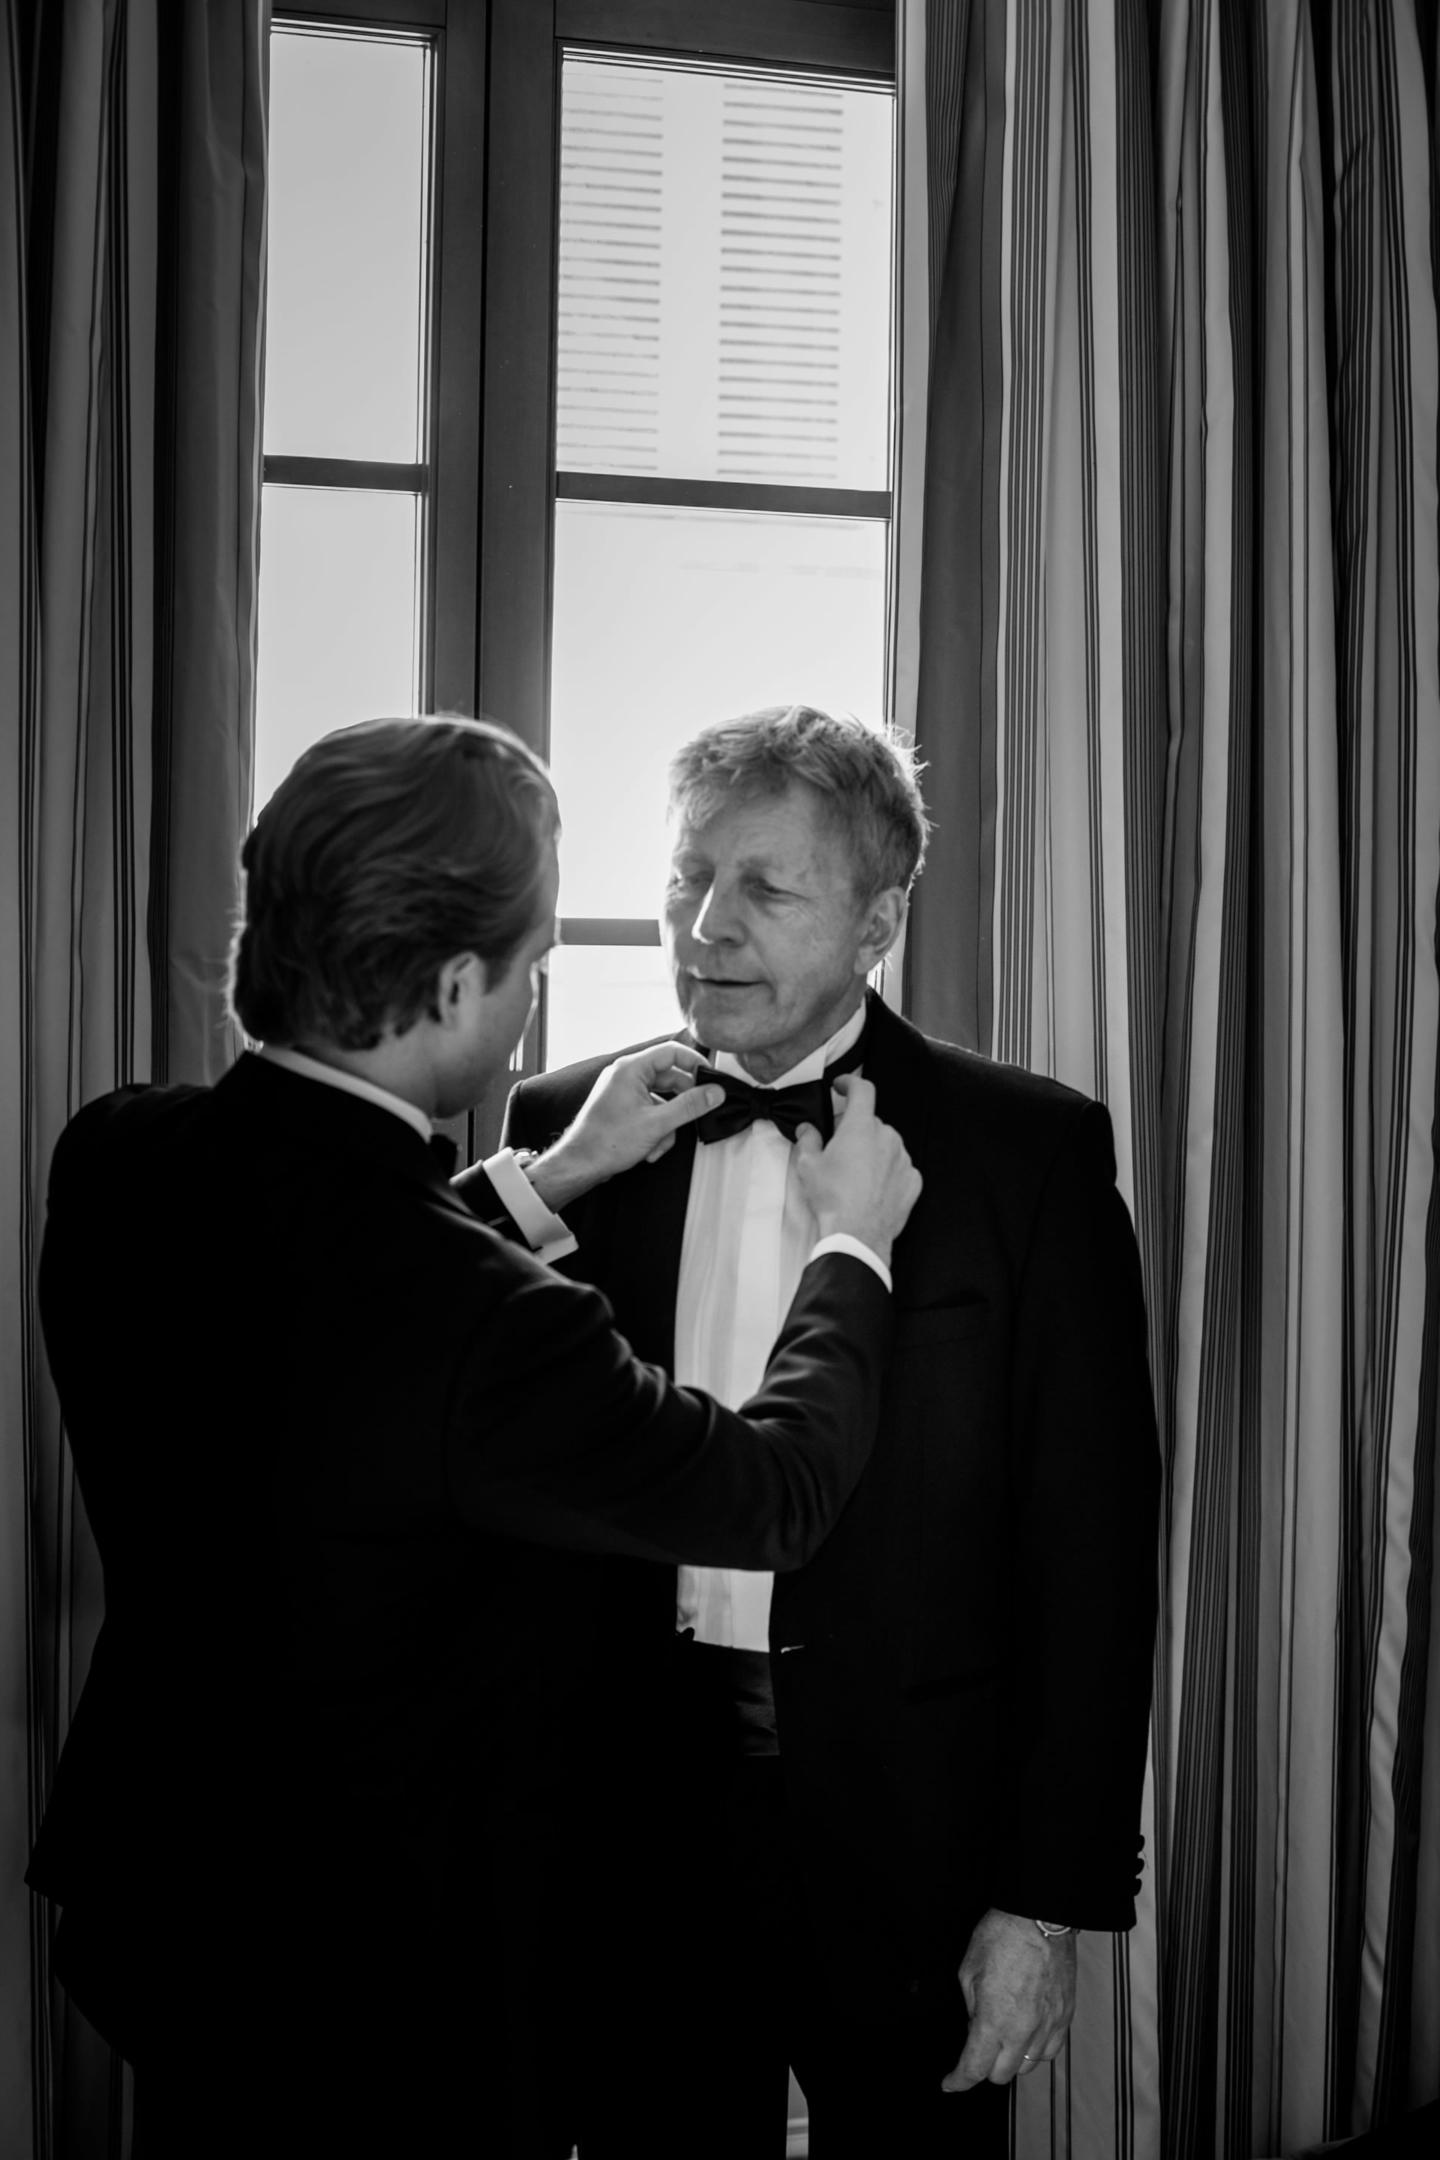 - 16 :: Alex and Steve :: Luxury wedding photography - 15 ::  - 16